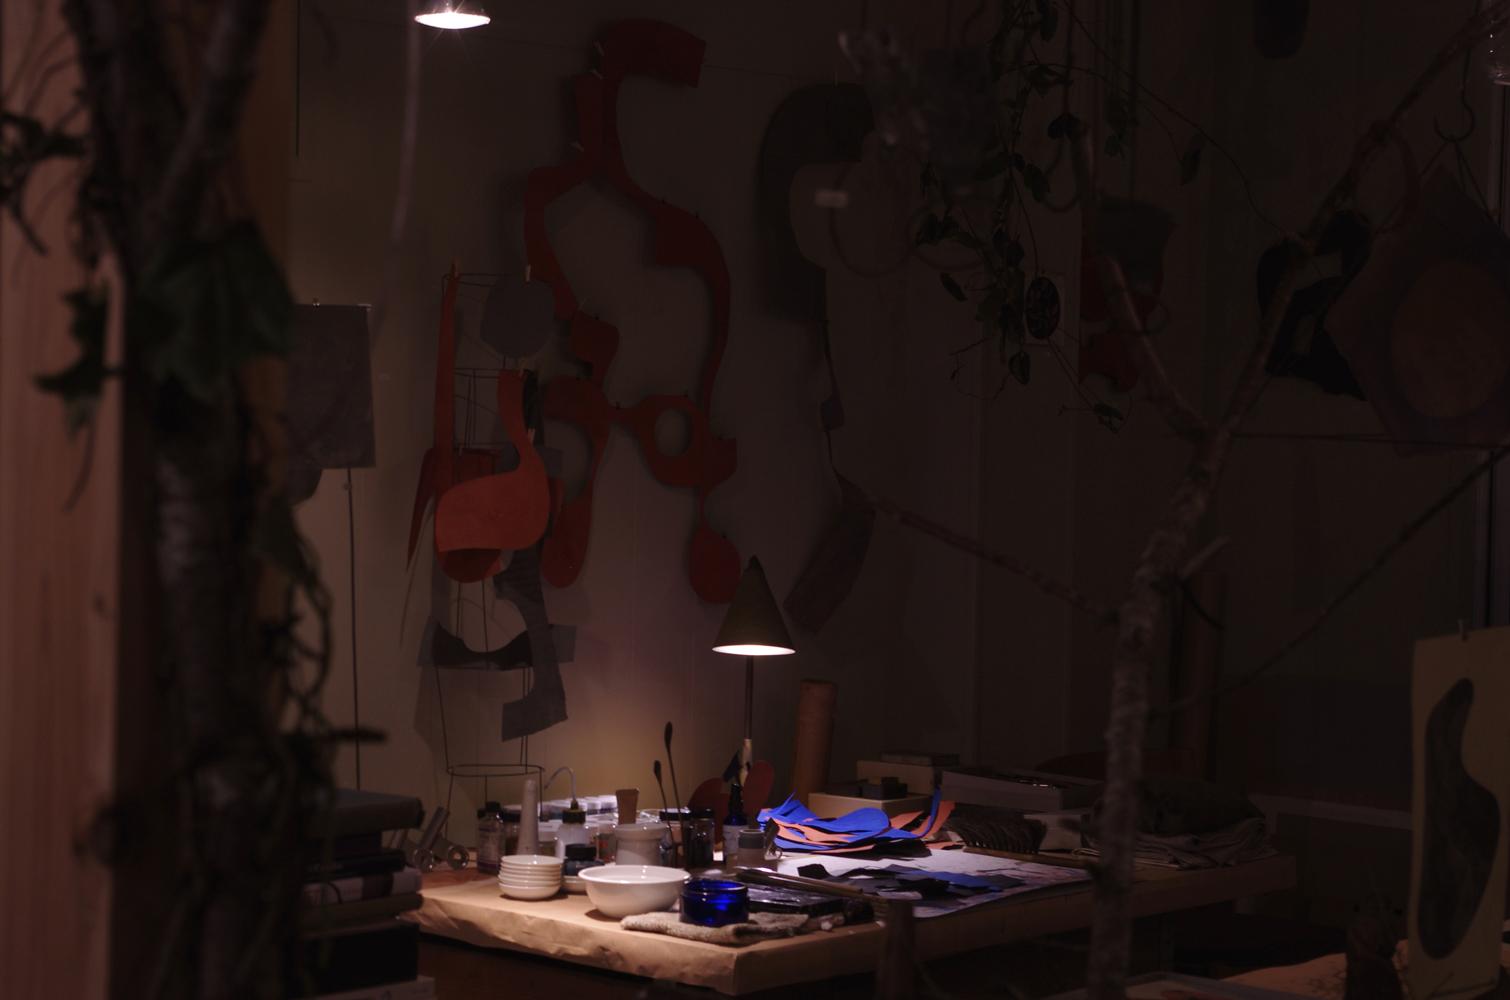 Fujikawa atelier 4-2